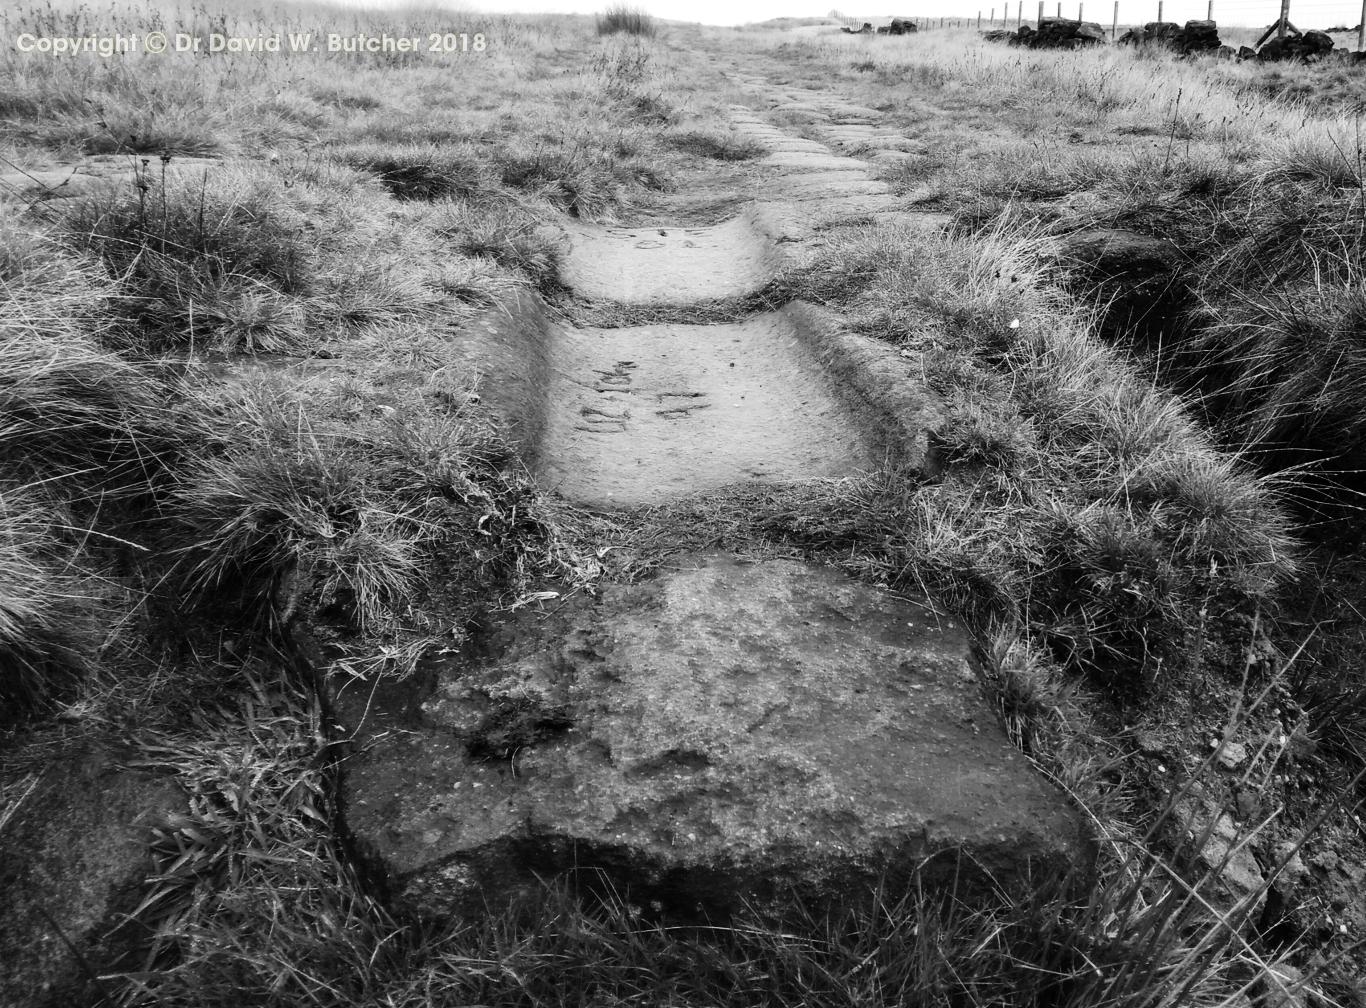 Blackstone Edge Roman Road near Littleborough